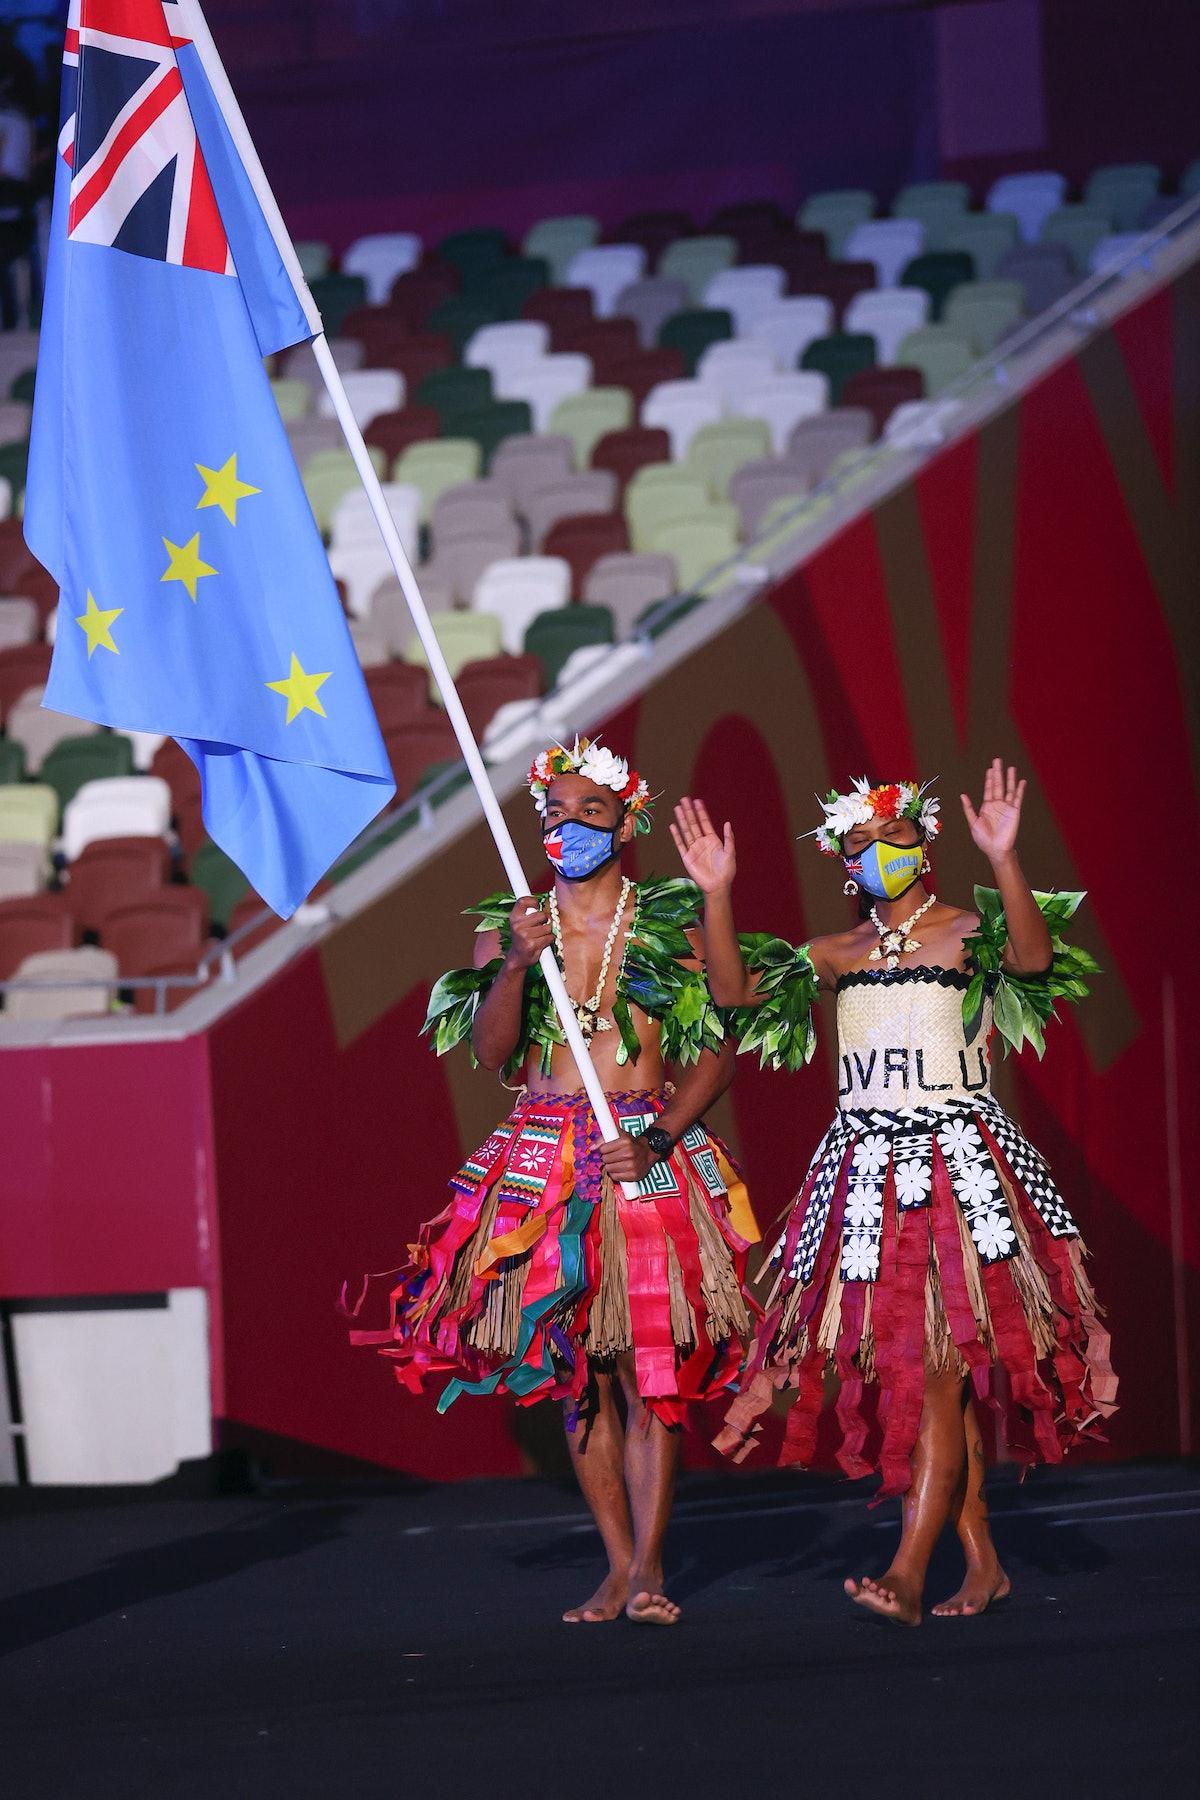 TOKYO, JAPAN - JULY 23: Flag bearers Matie Stanley and Karalo Hepoiteloto Maibuca of Team Tuvalu dur...